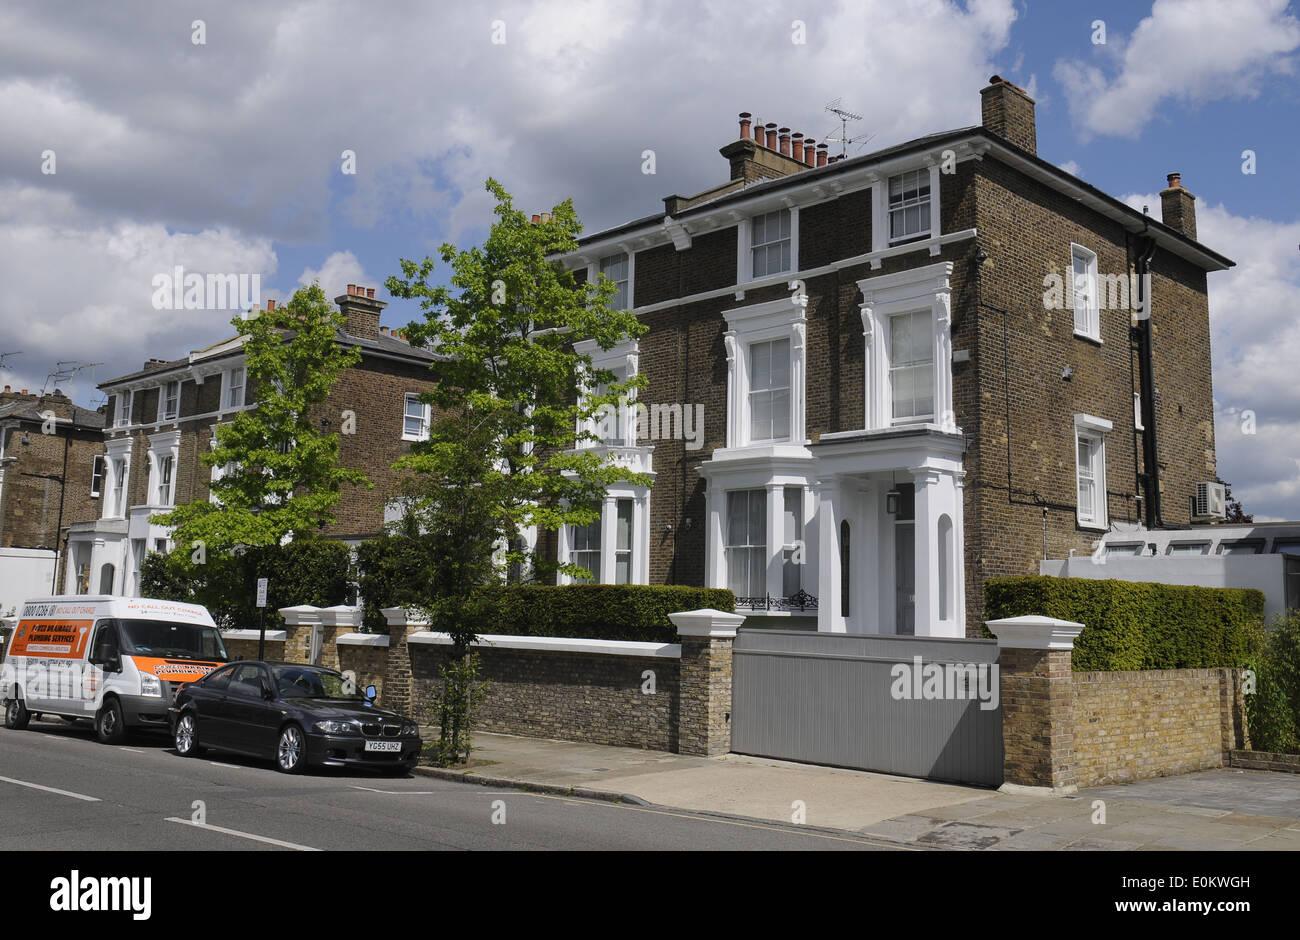 Gwyneth Paltrow Chris Martins London Home In Belsize ParkLondon UK